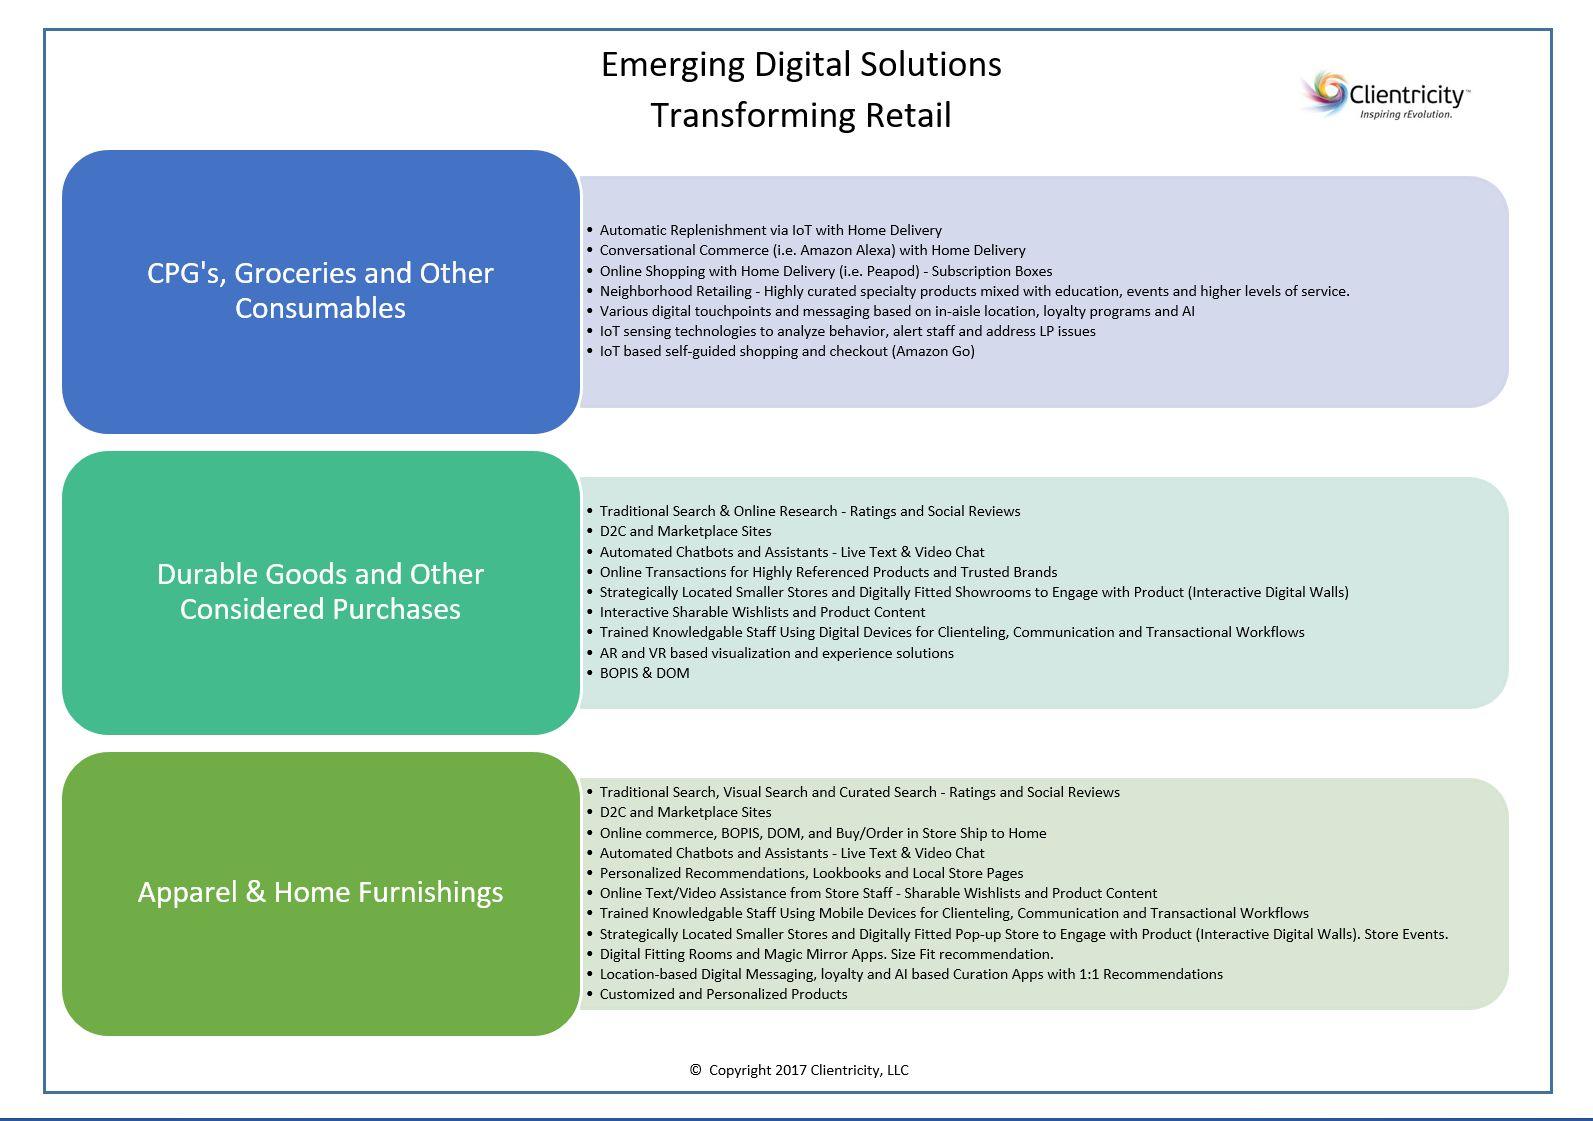 Emerging Digital Solutions Image